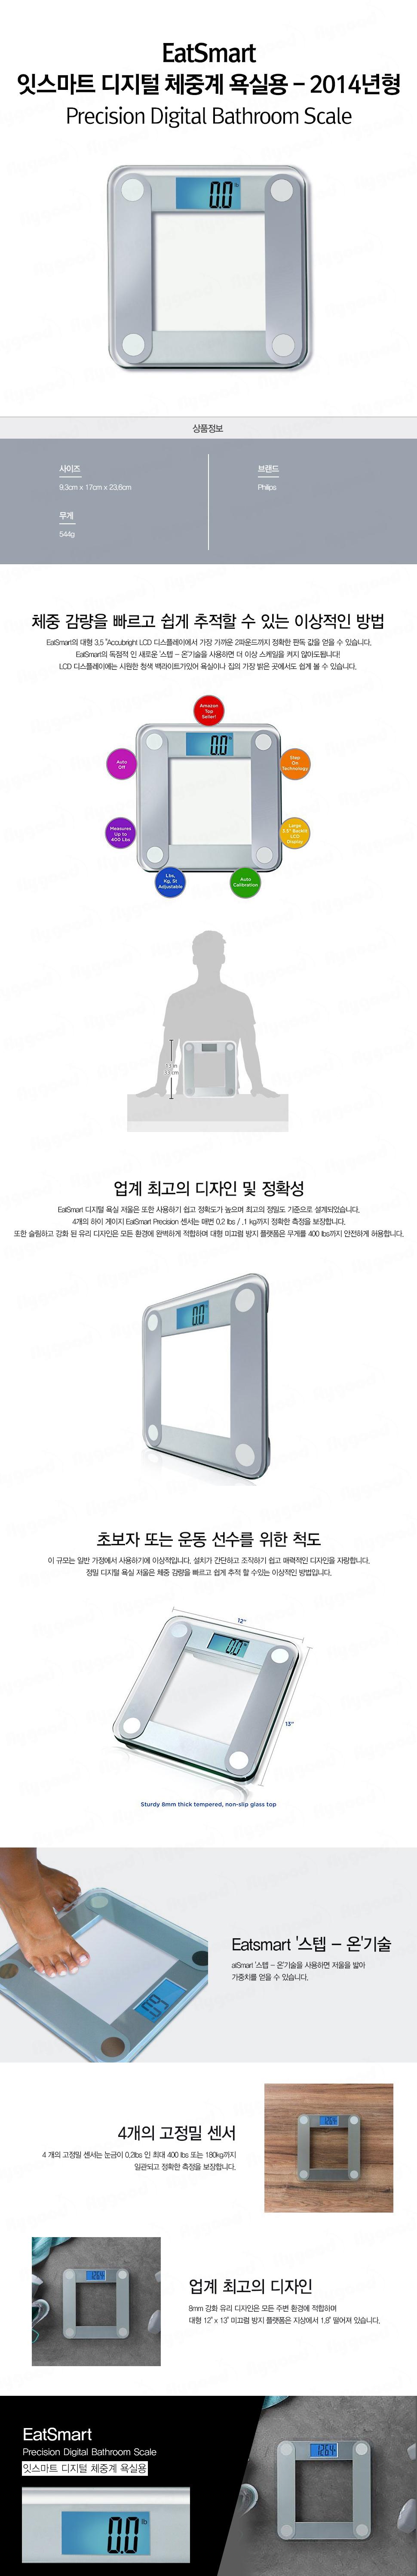 EatSmart_Precision_Digital_Bathroom_Scale_디지털체중계_욕실용.jpg